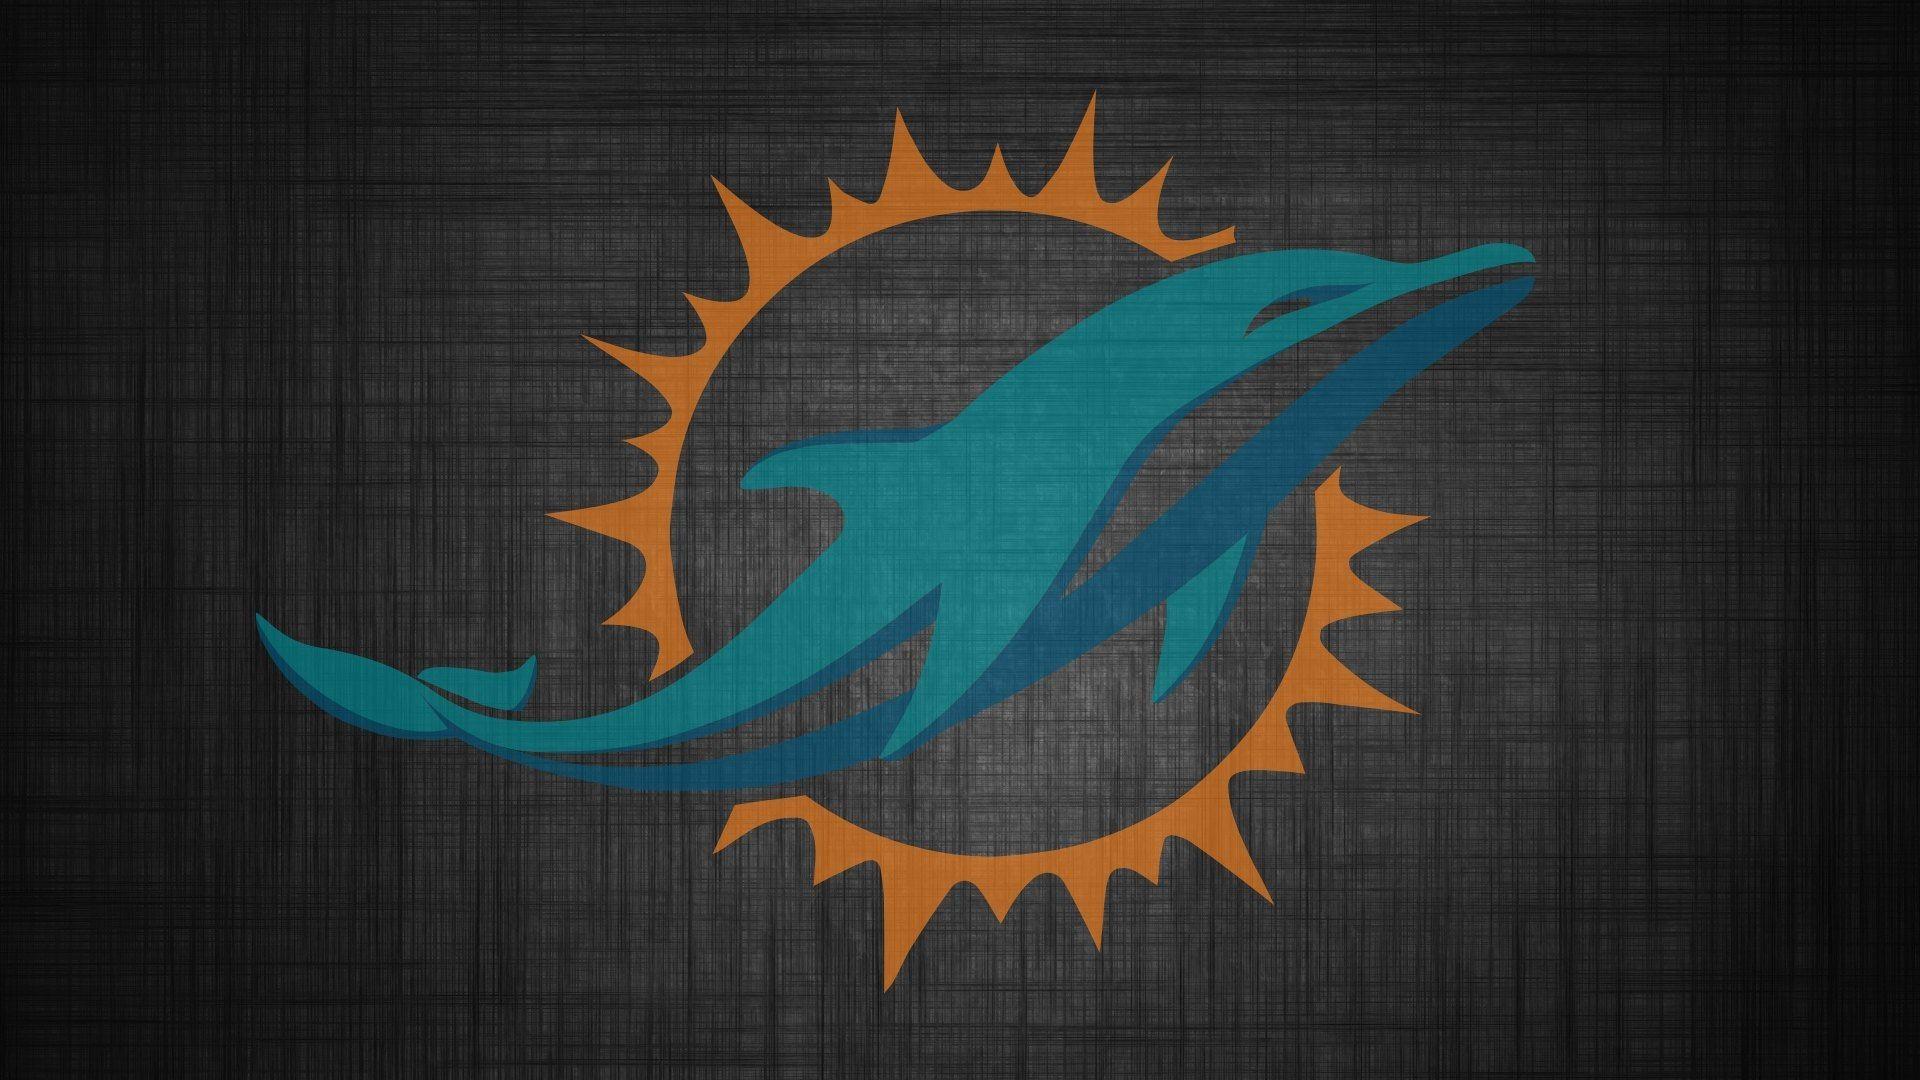 Miami Dolphins Computer Wallpaper 52924